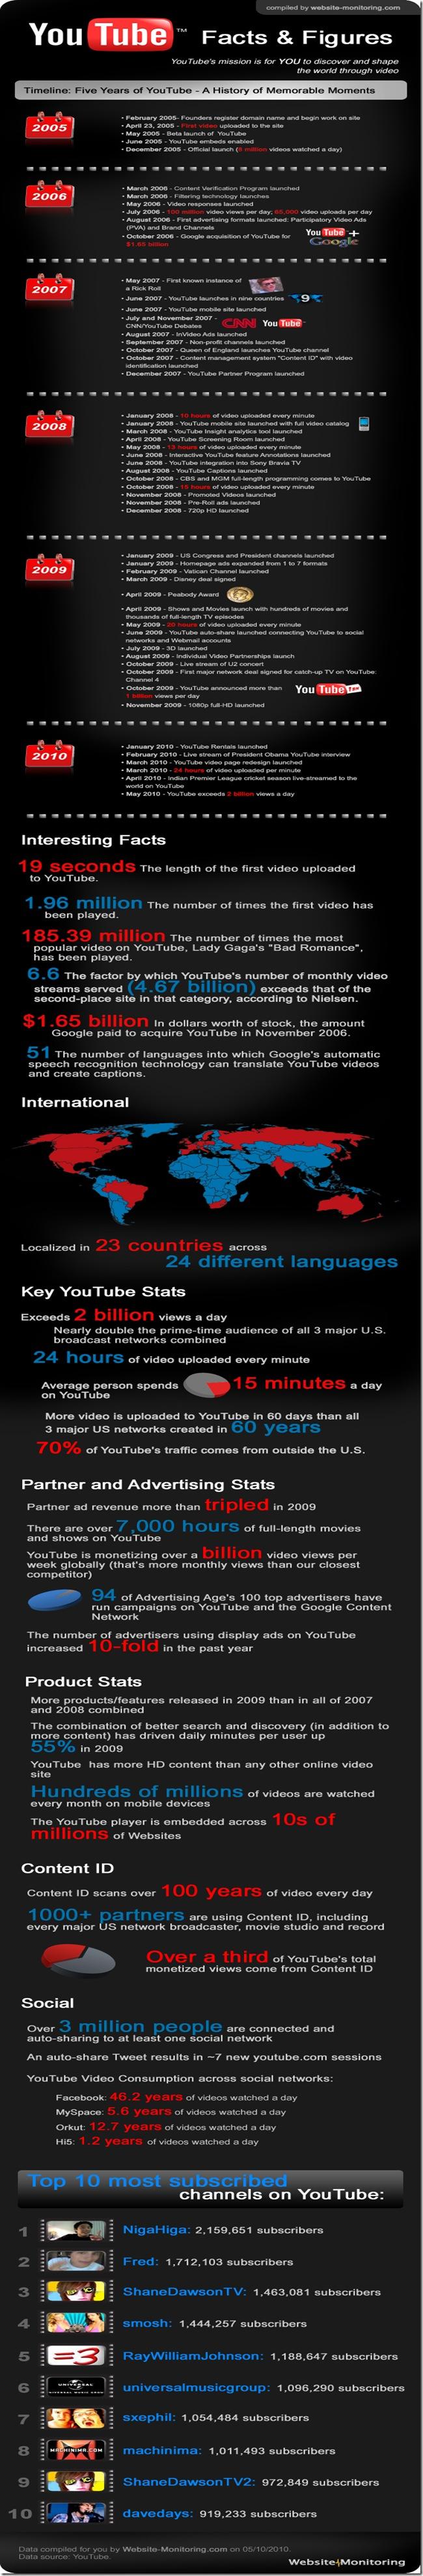 youtube-infographic-565